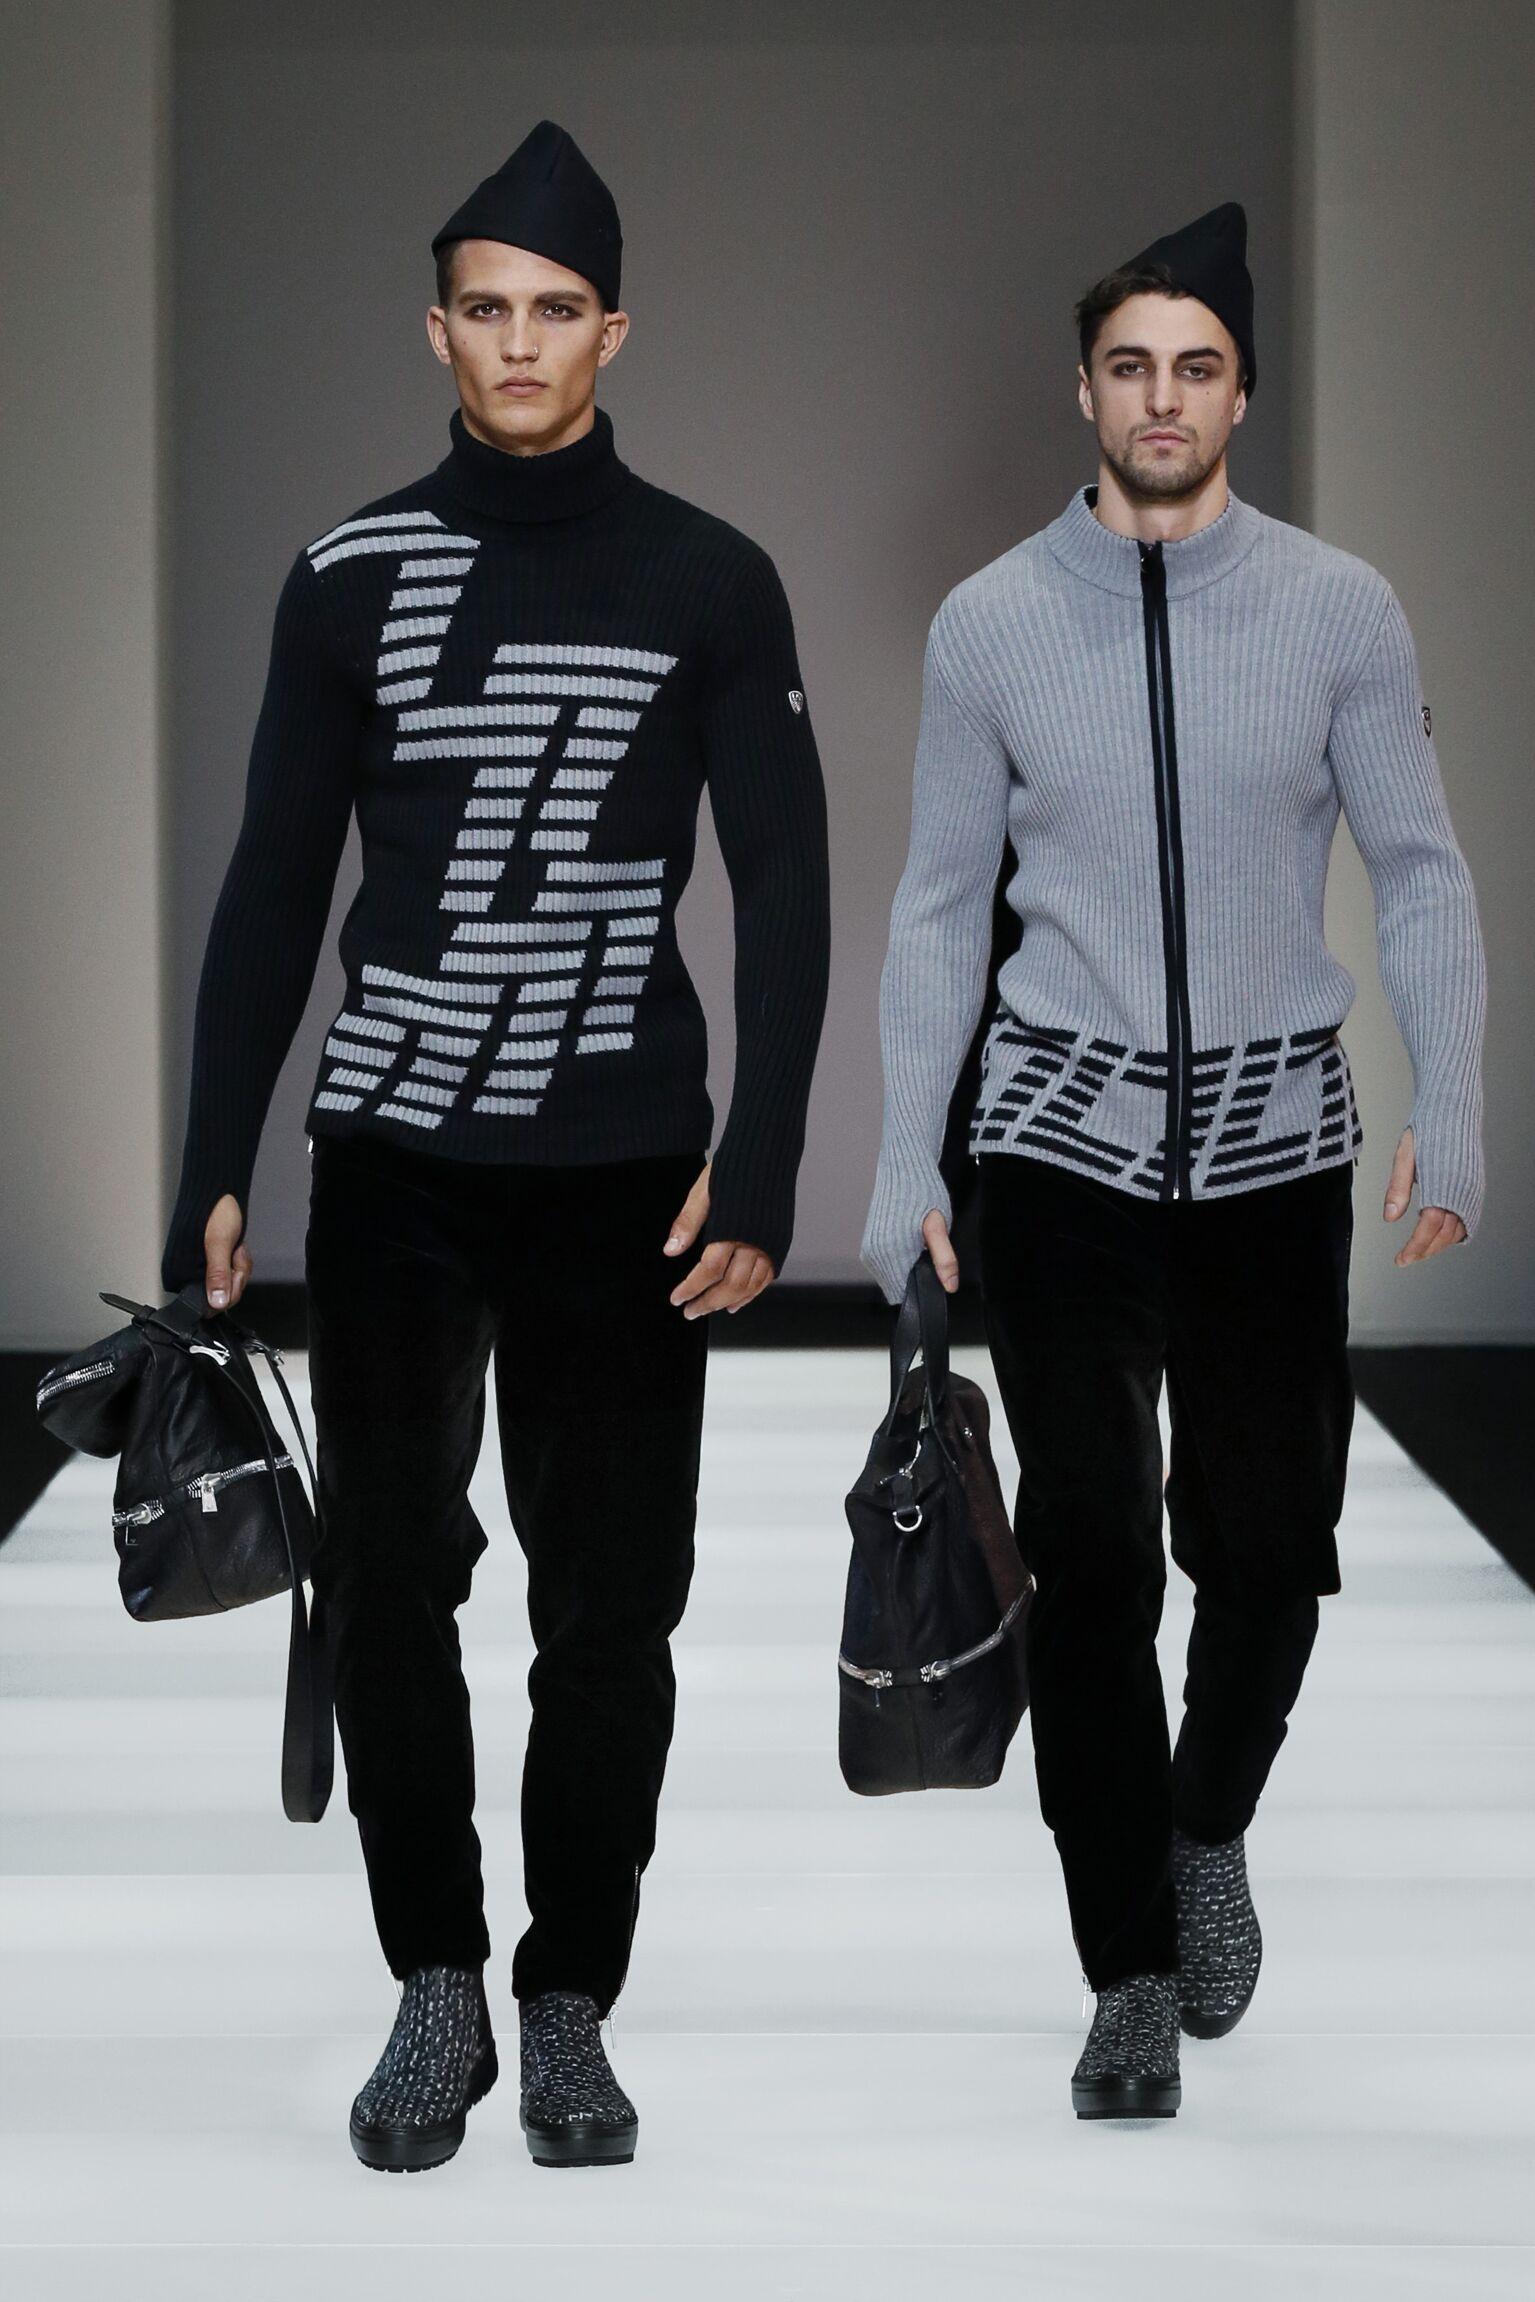 Runway Emporio Armani Fall Winter 2015 16 Men's Collection Milano Fashion Week